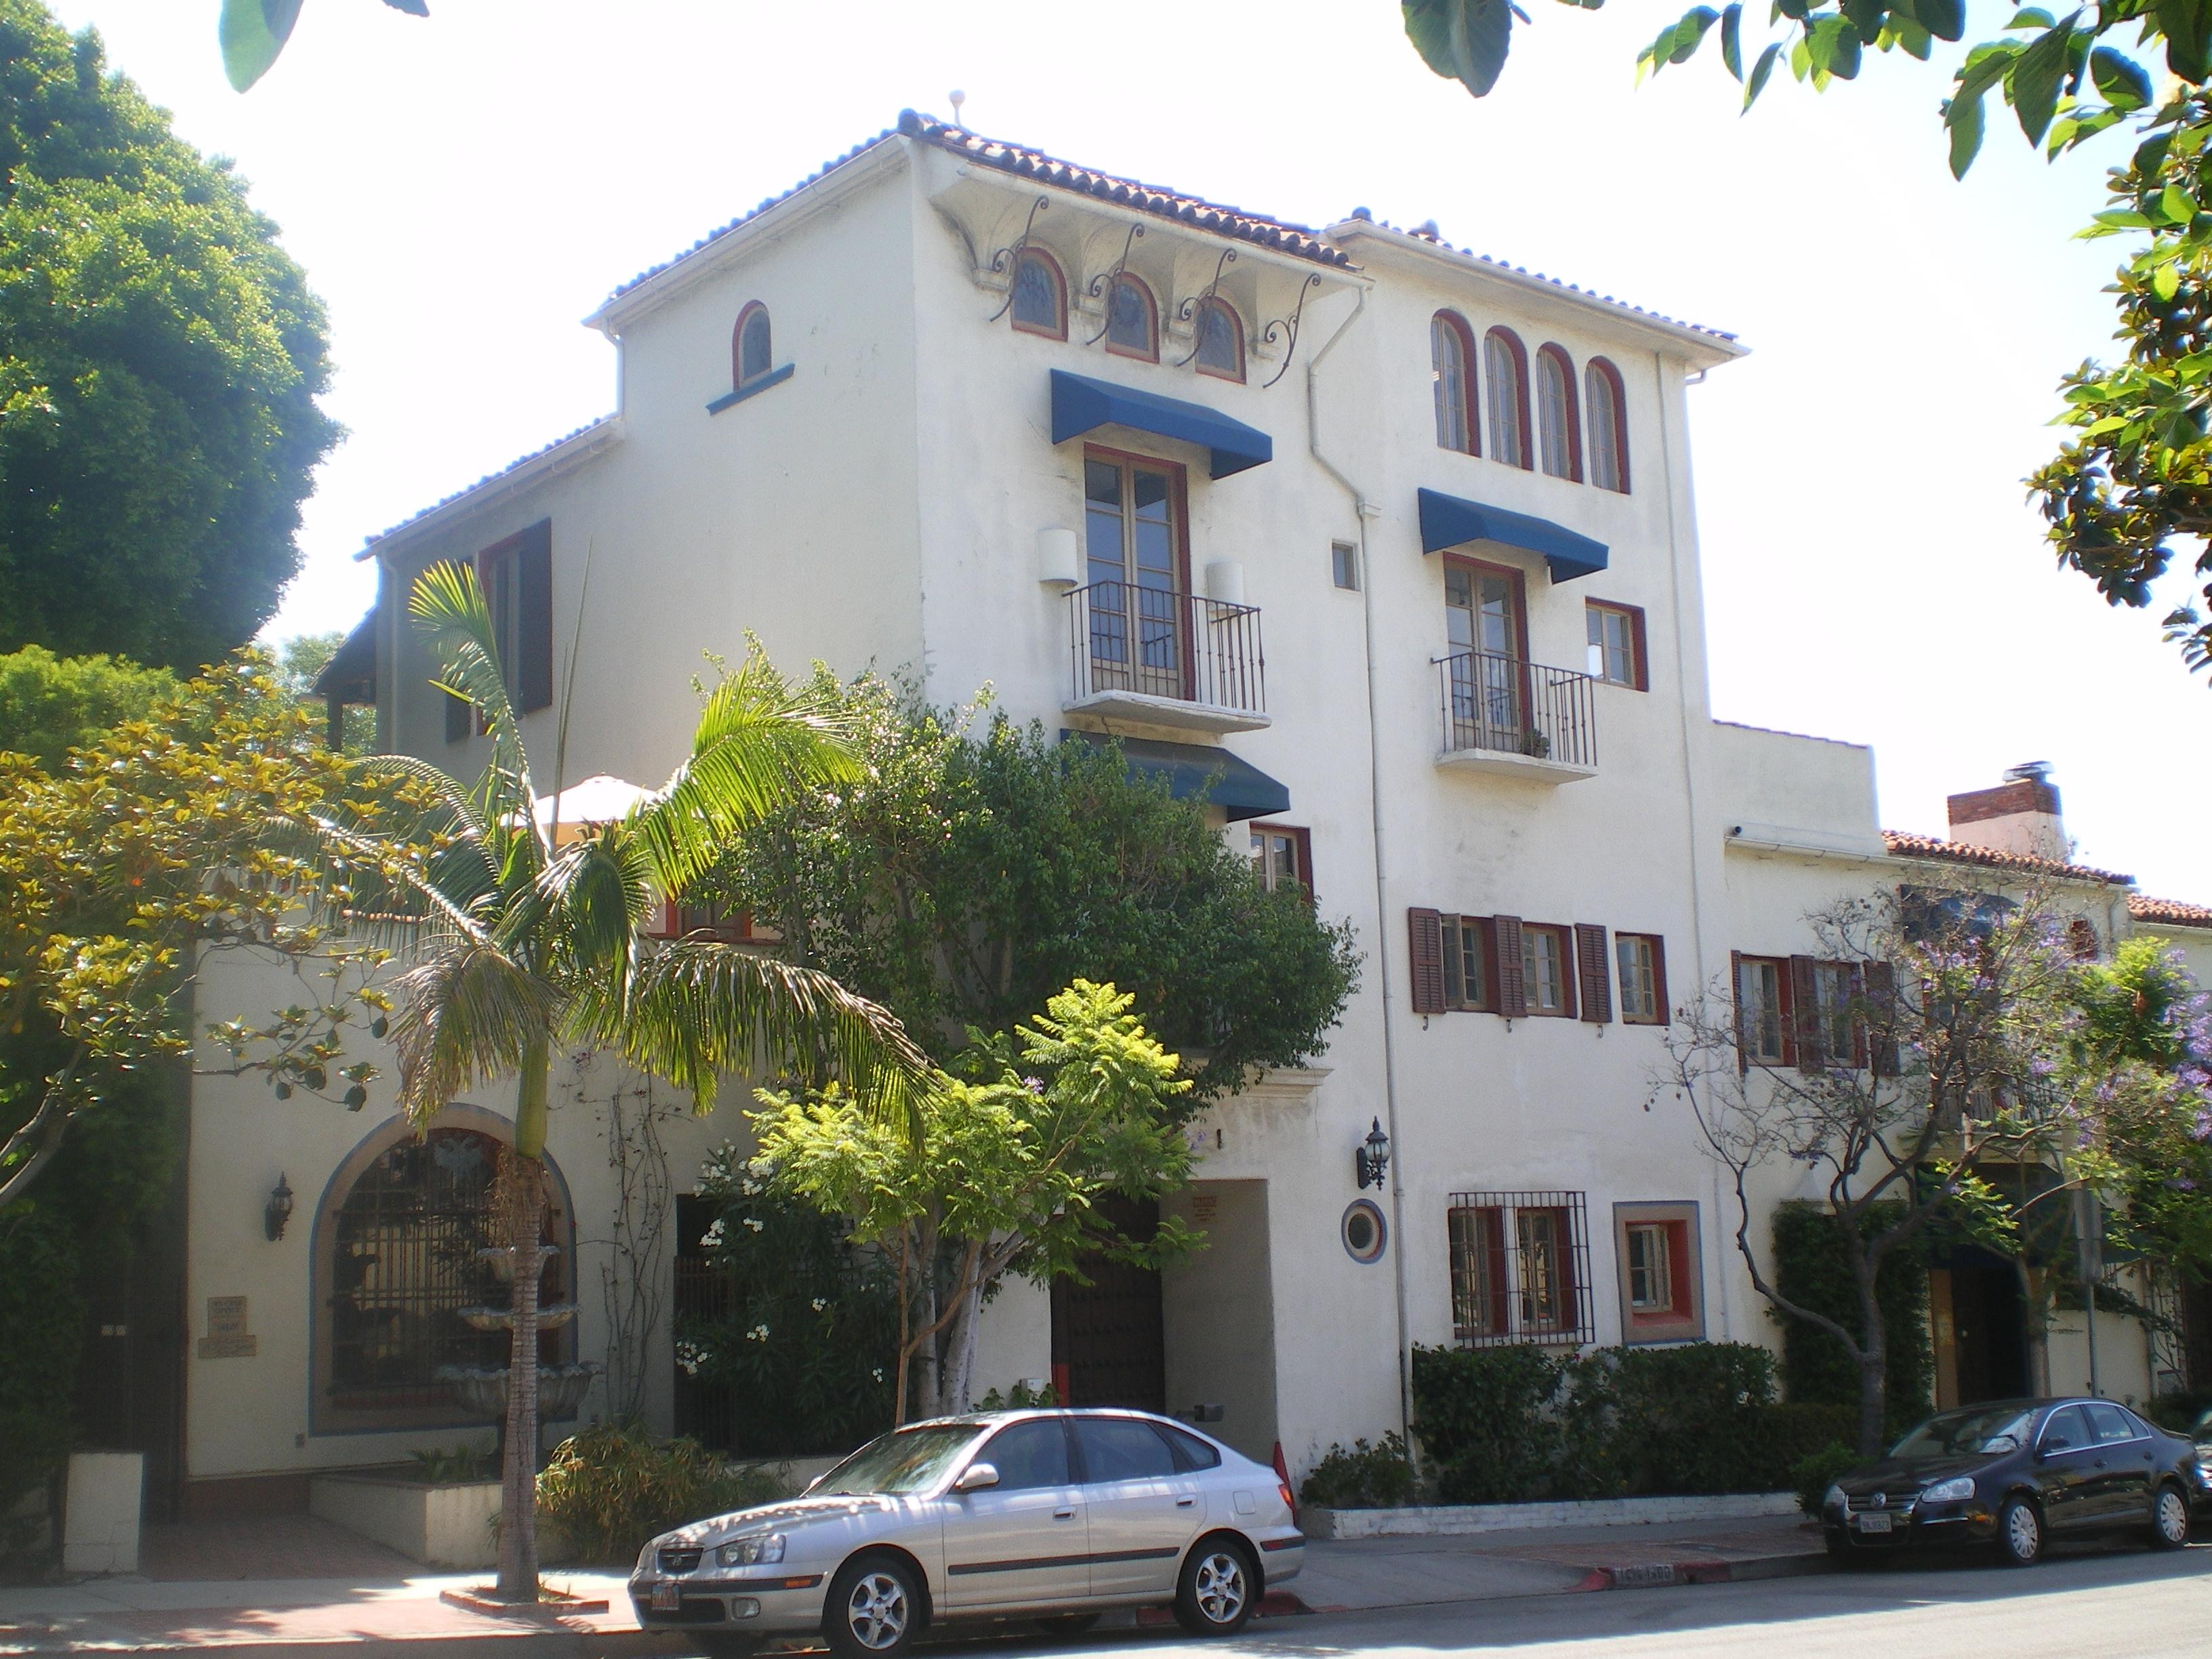 File Ronda West Hollywood Jpg Wikimedia Commons